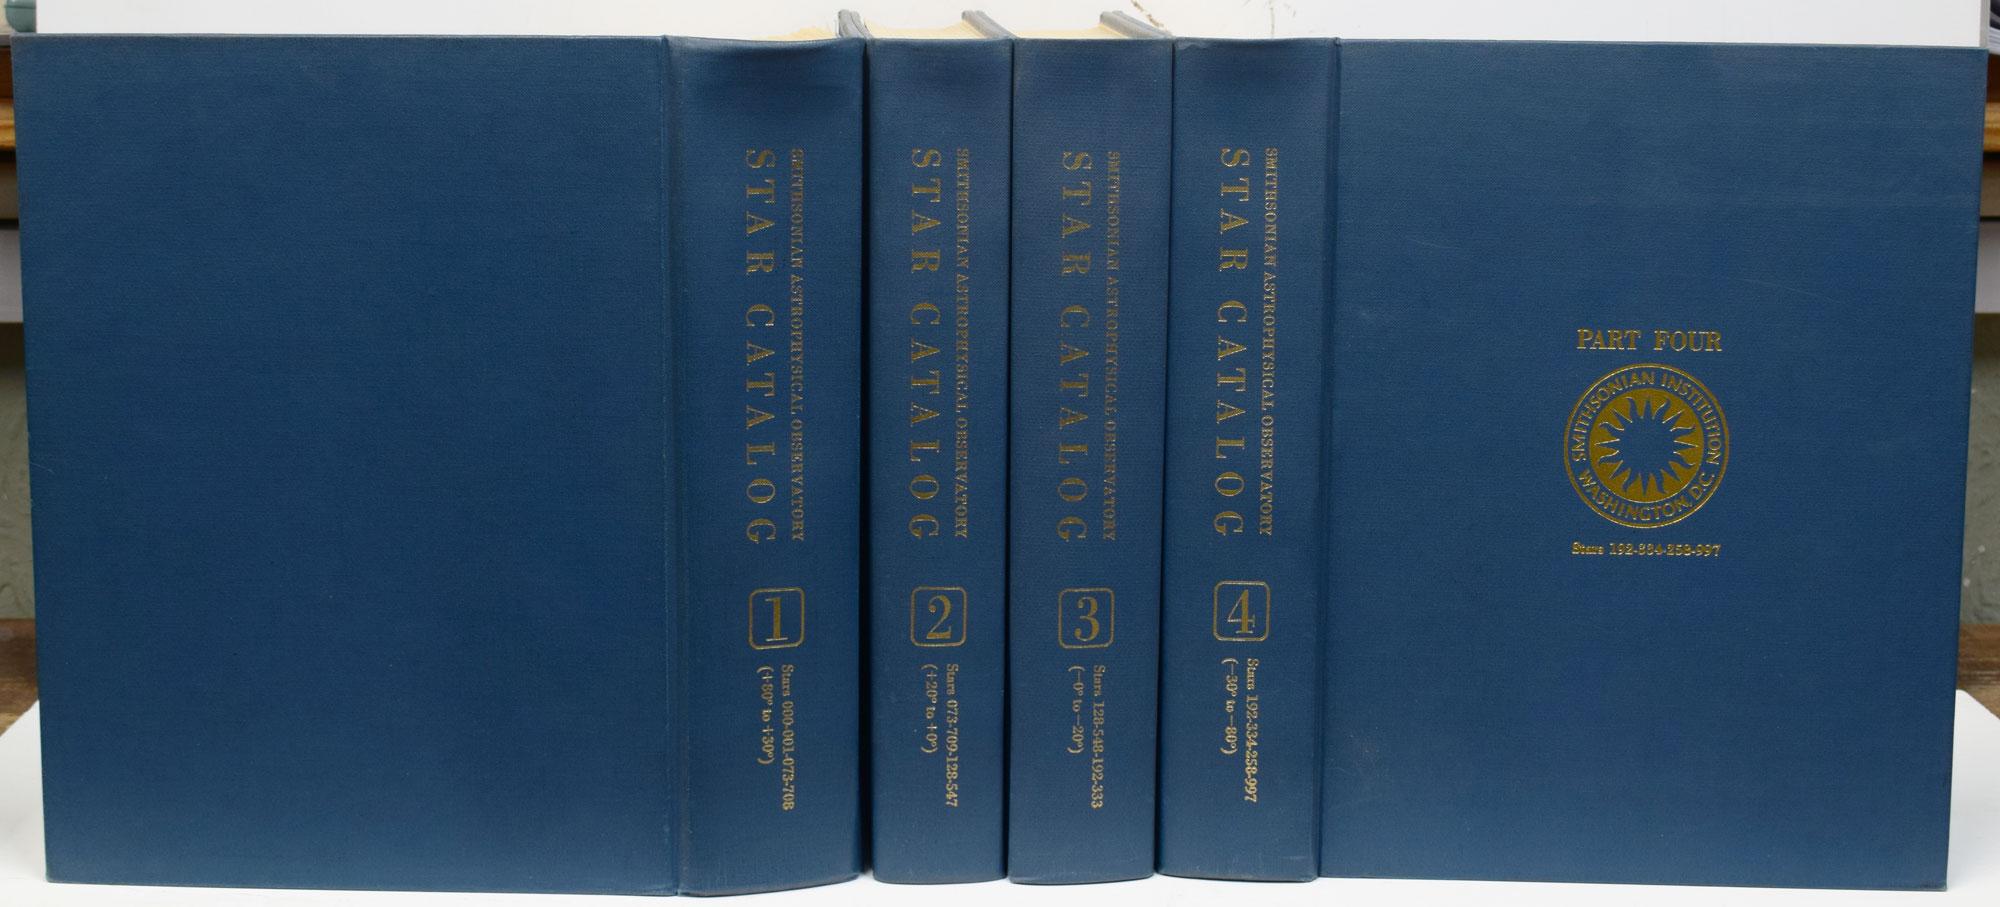 [SMITHSONIAN STAFF] - Star Catalog : Smithsonian Astrophysical Observatory. 4 Volume Set